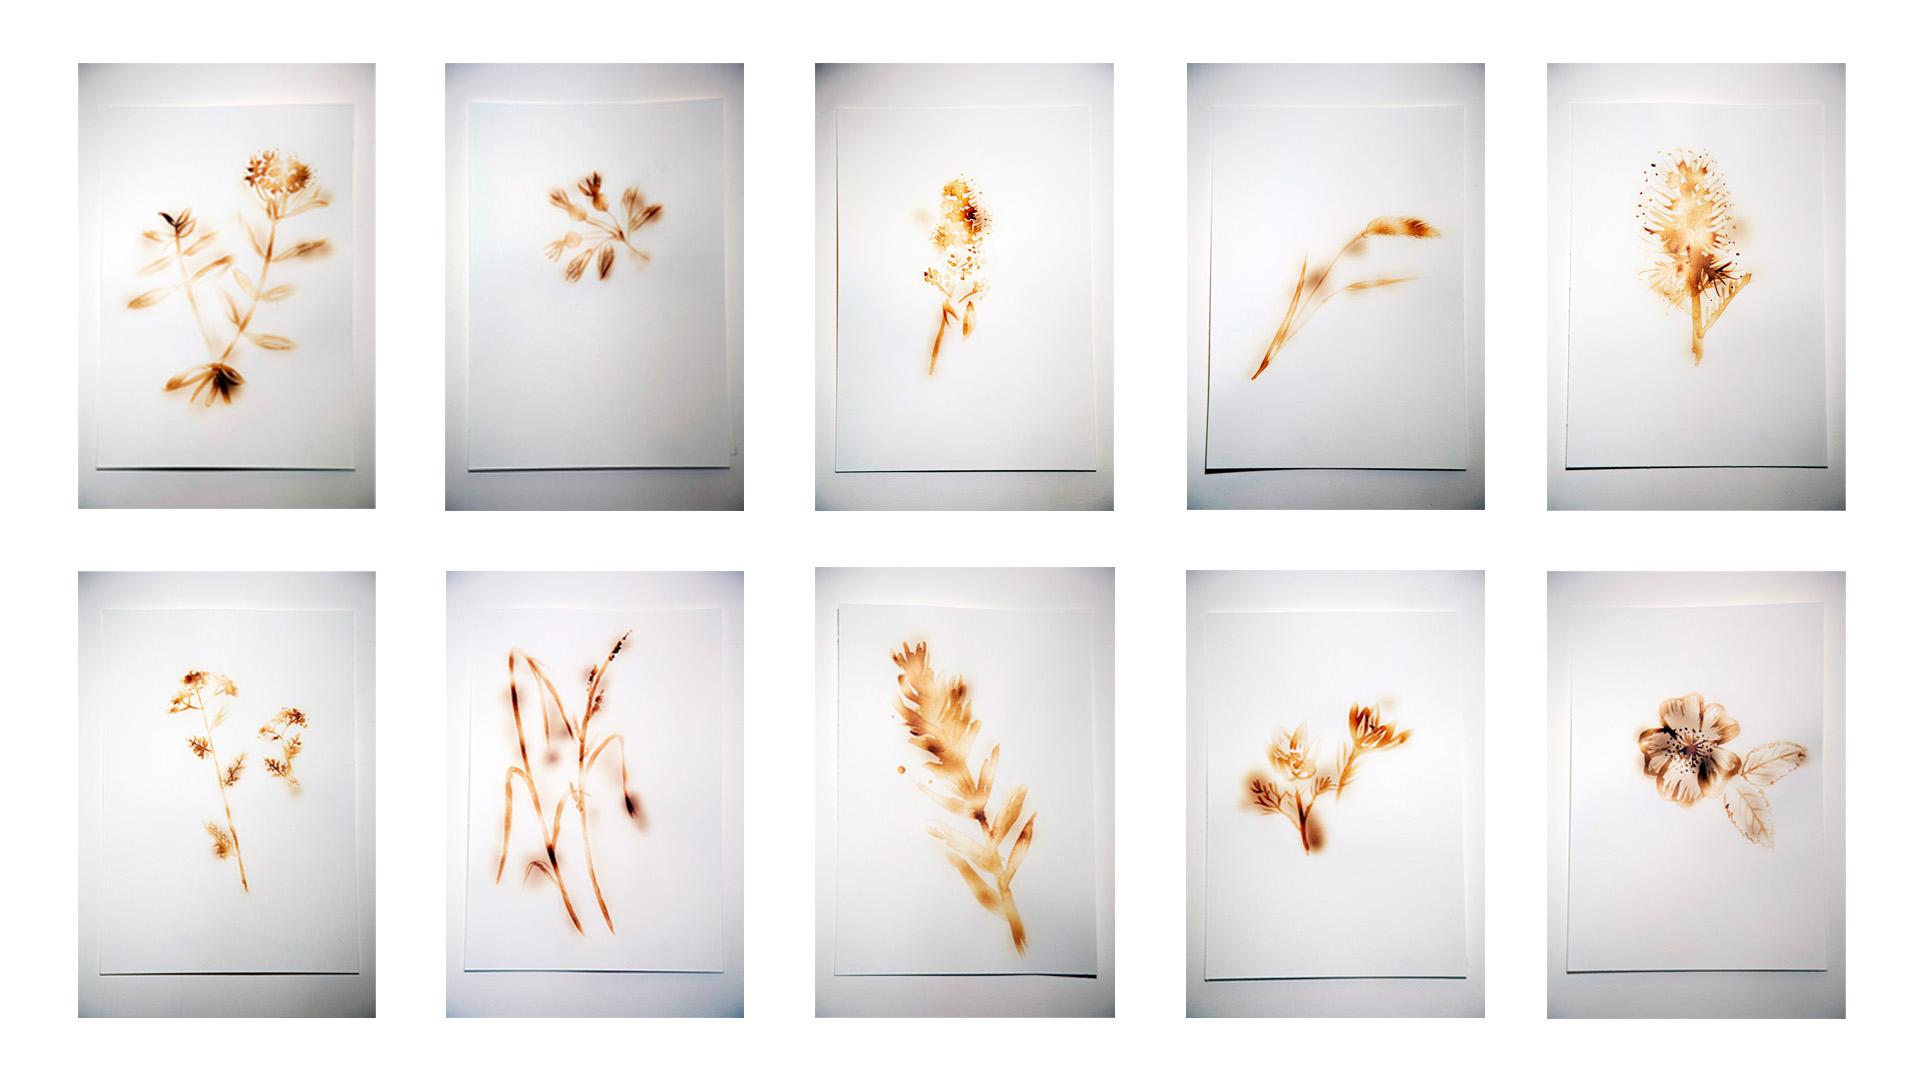 Alana Bartol, Invisible Impacts: Plants of Grassy Mountain, 2020. Heated milk on paper, 17.78 x 25.4 cm. Photo: blkarts.ca.